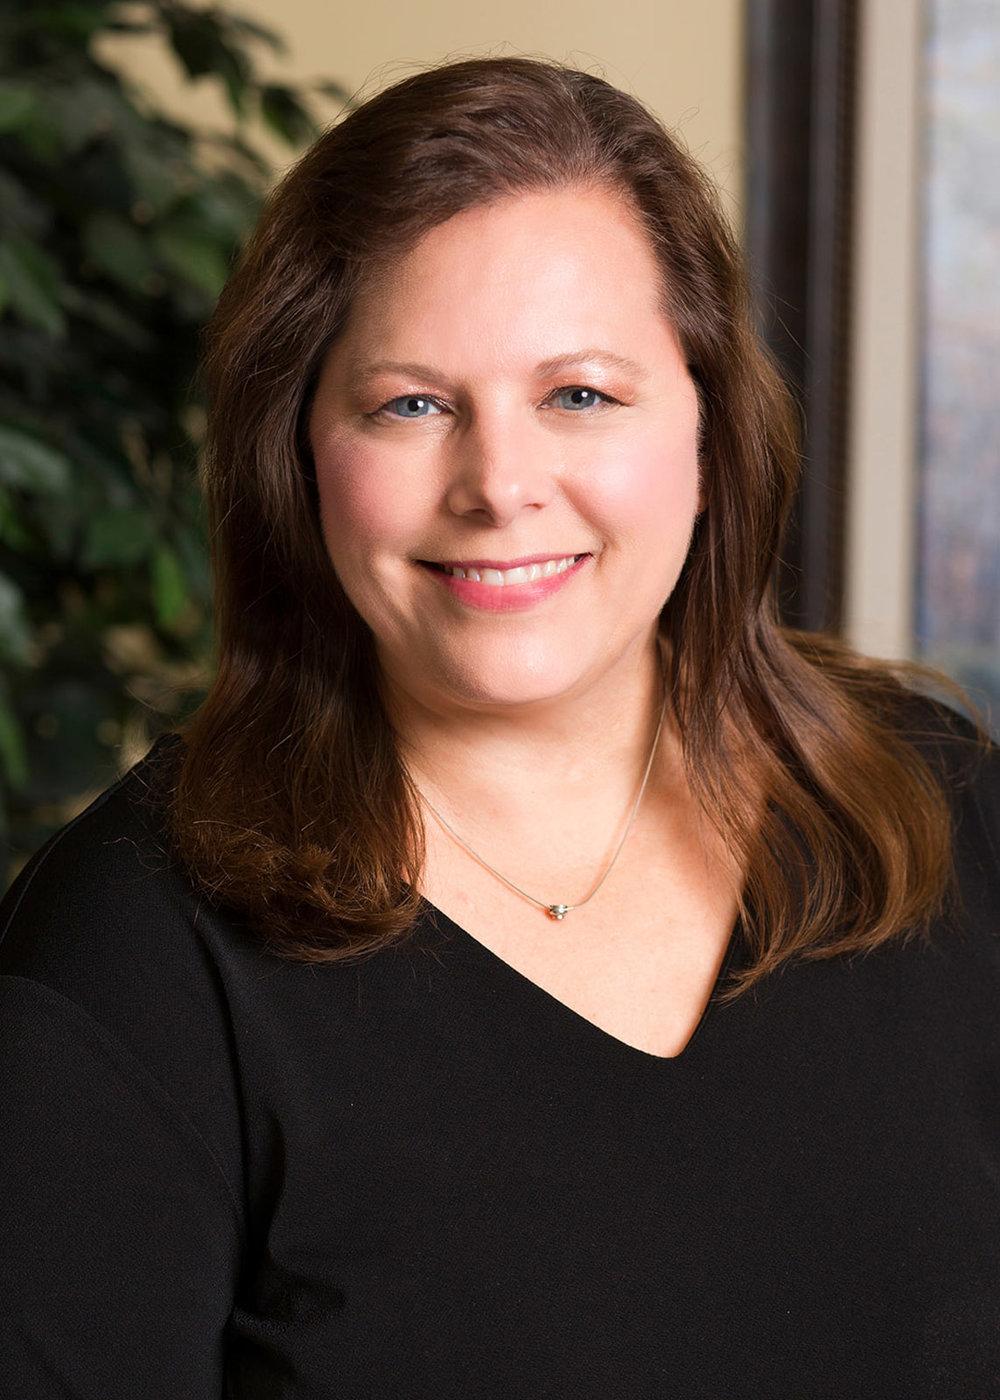 Lynn N. Ellington, M.D.